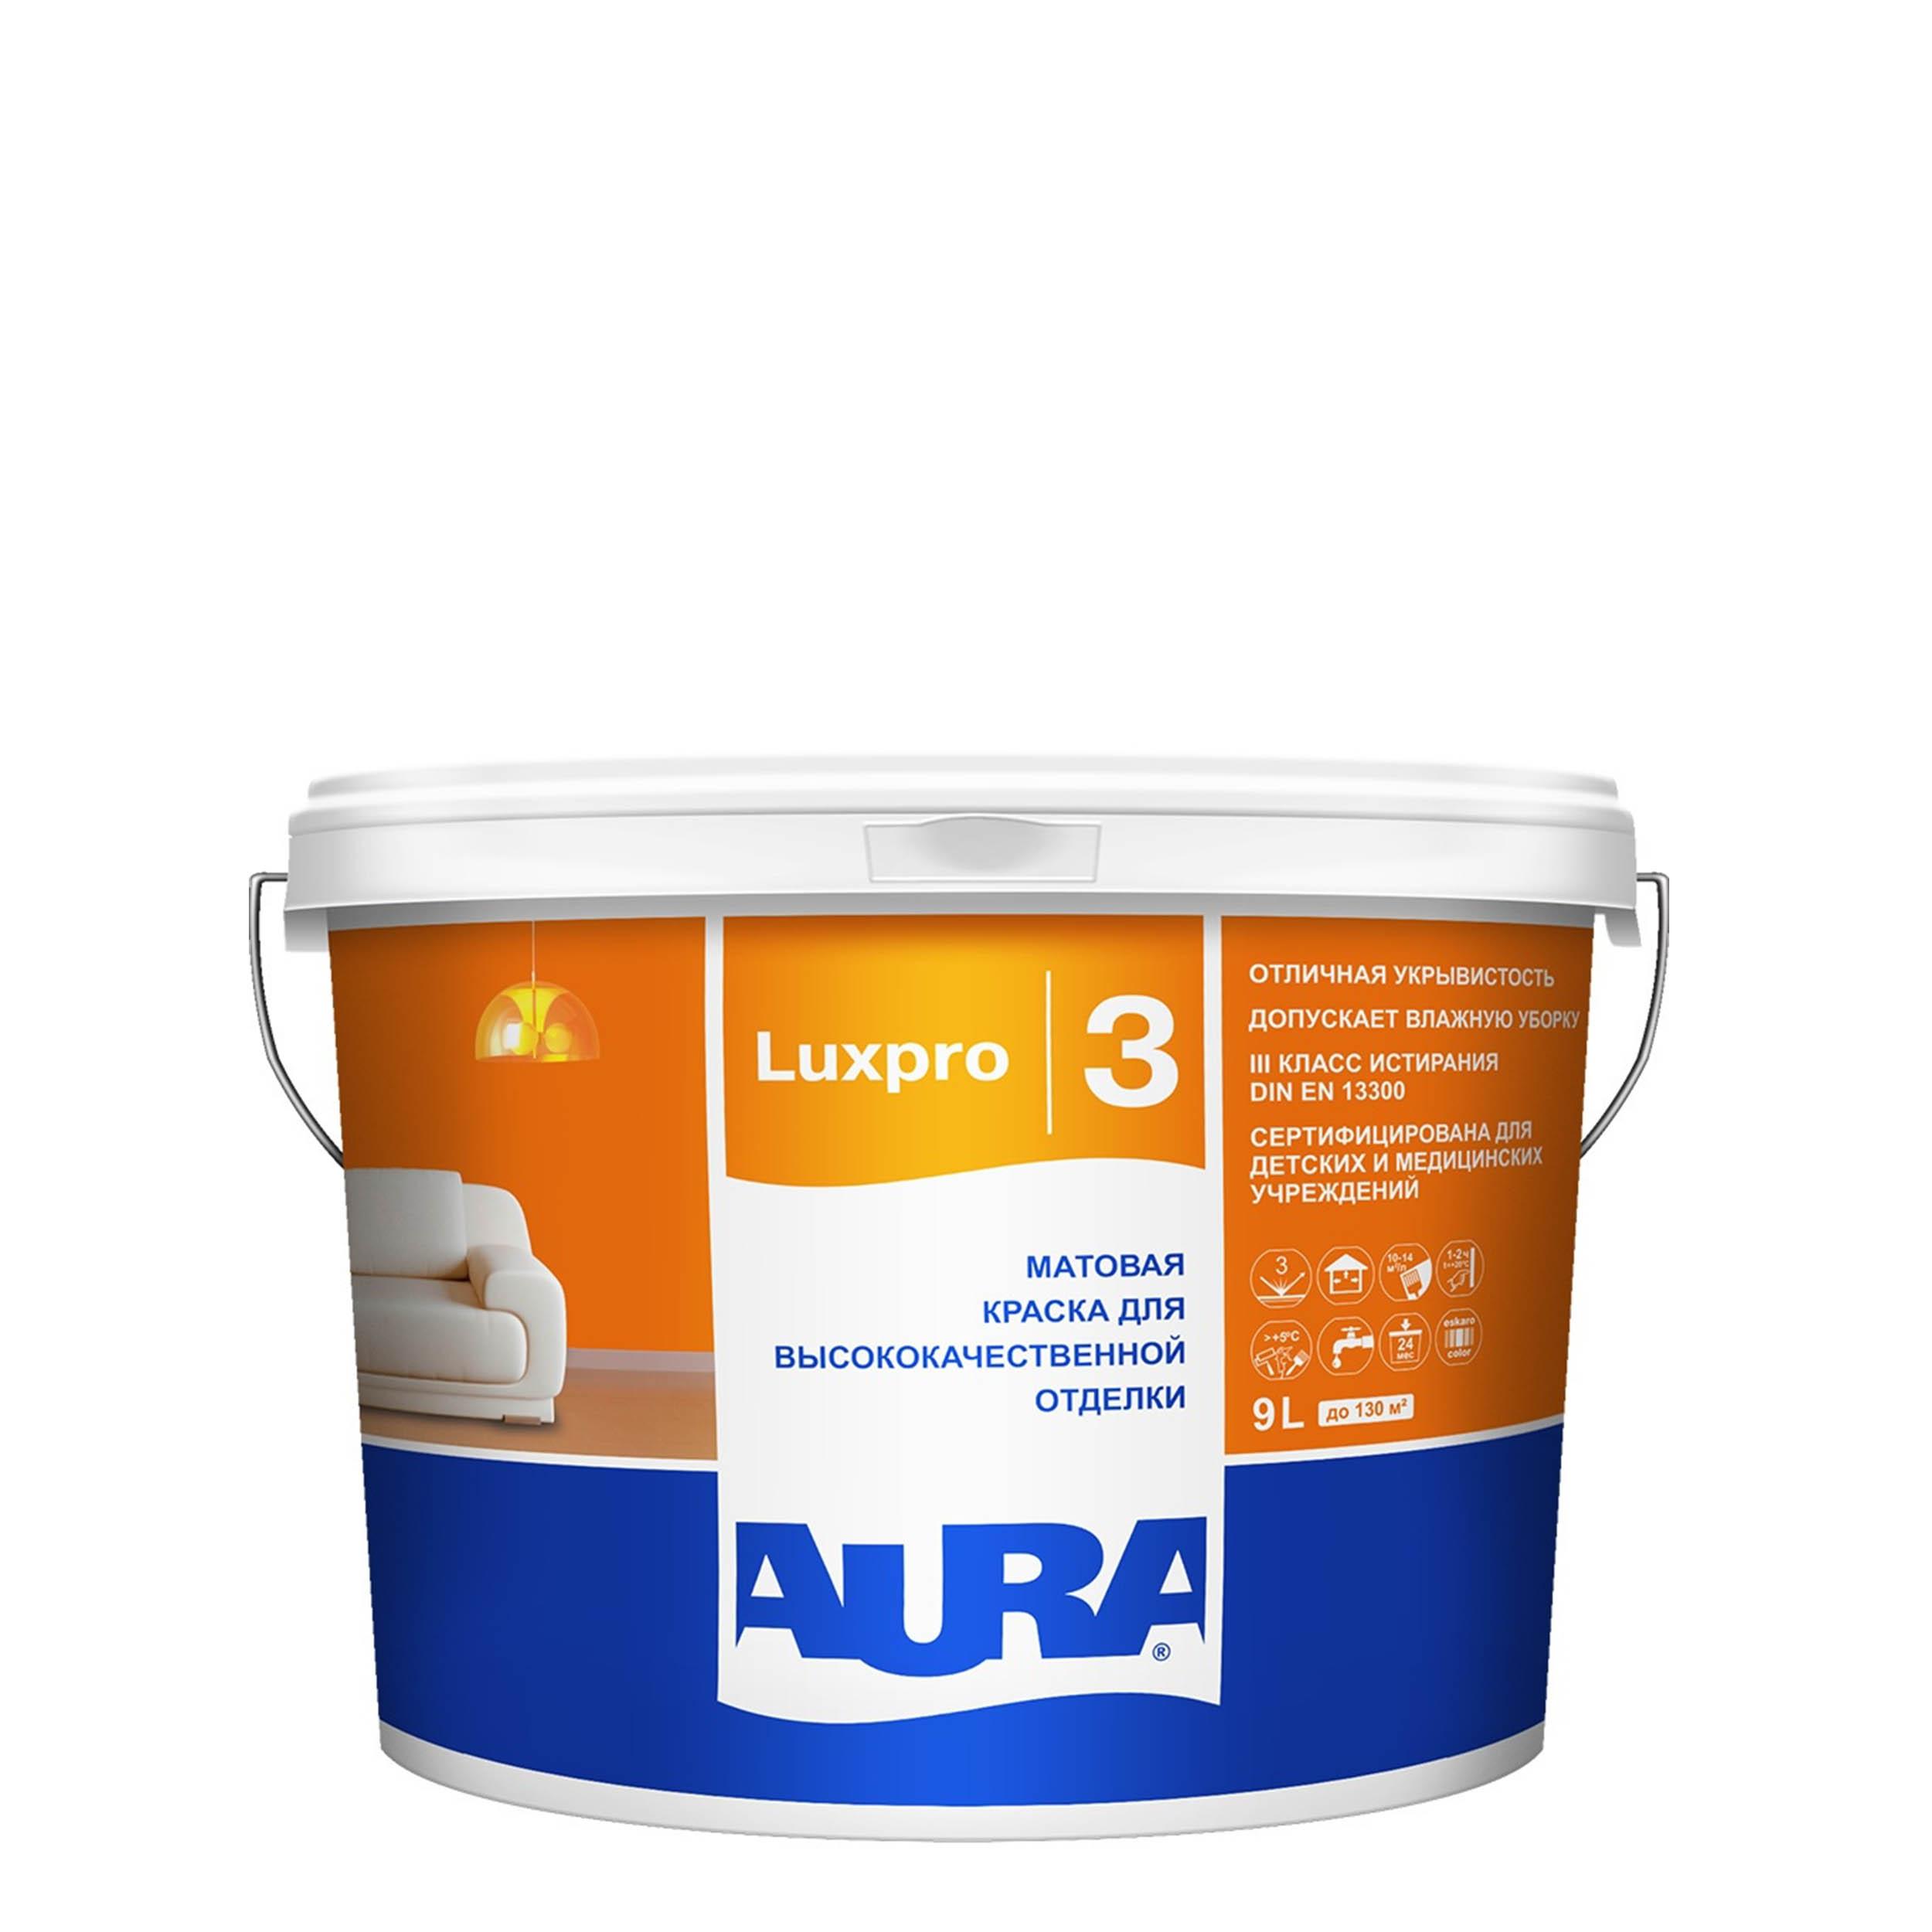 Фото 3 - Краска интерьерная, Aura LuxPRO 3, RAL 2010, 11 кг.